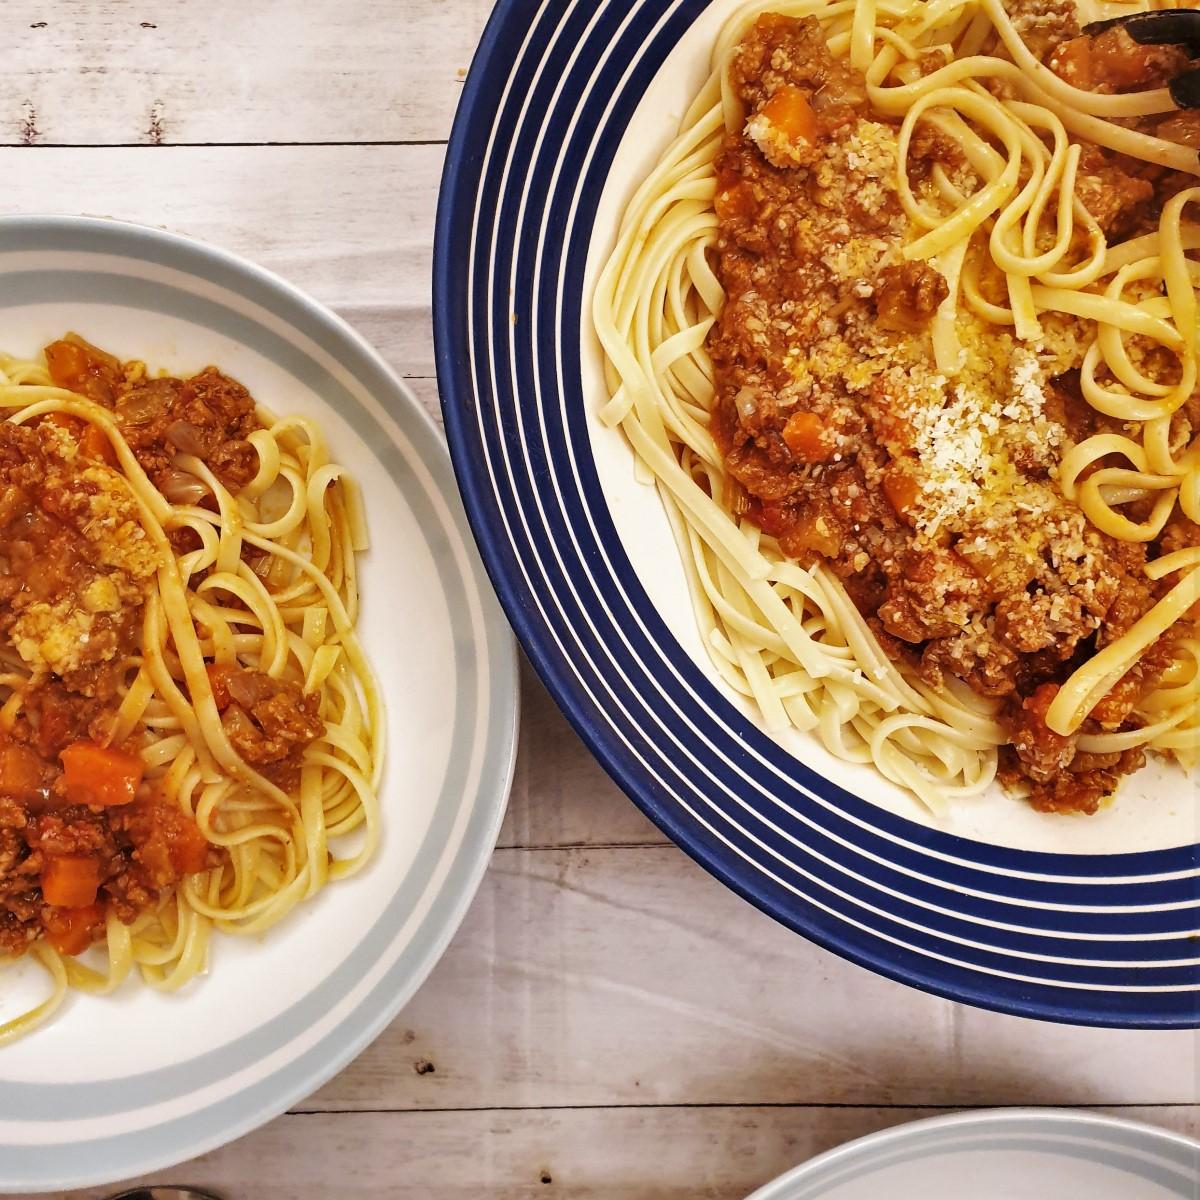 Two bowls of lamb ragu over pasta.